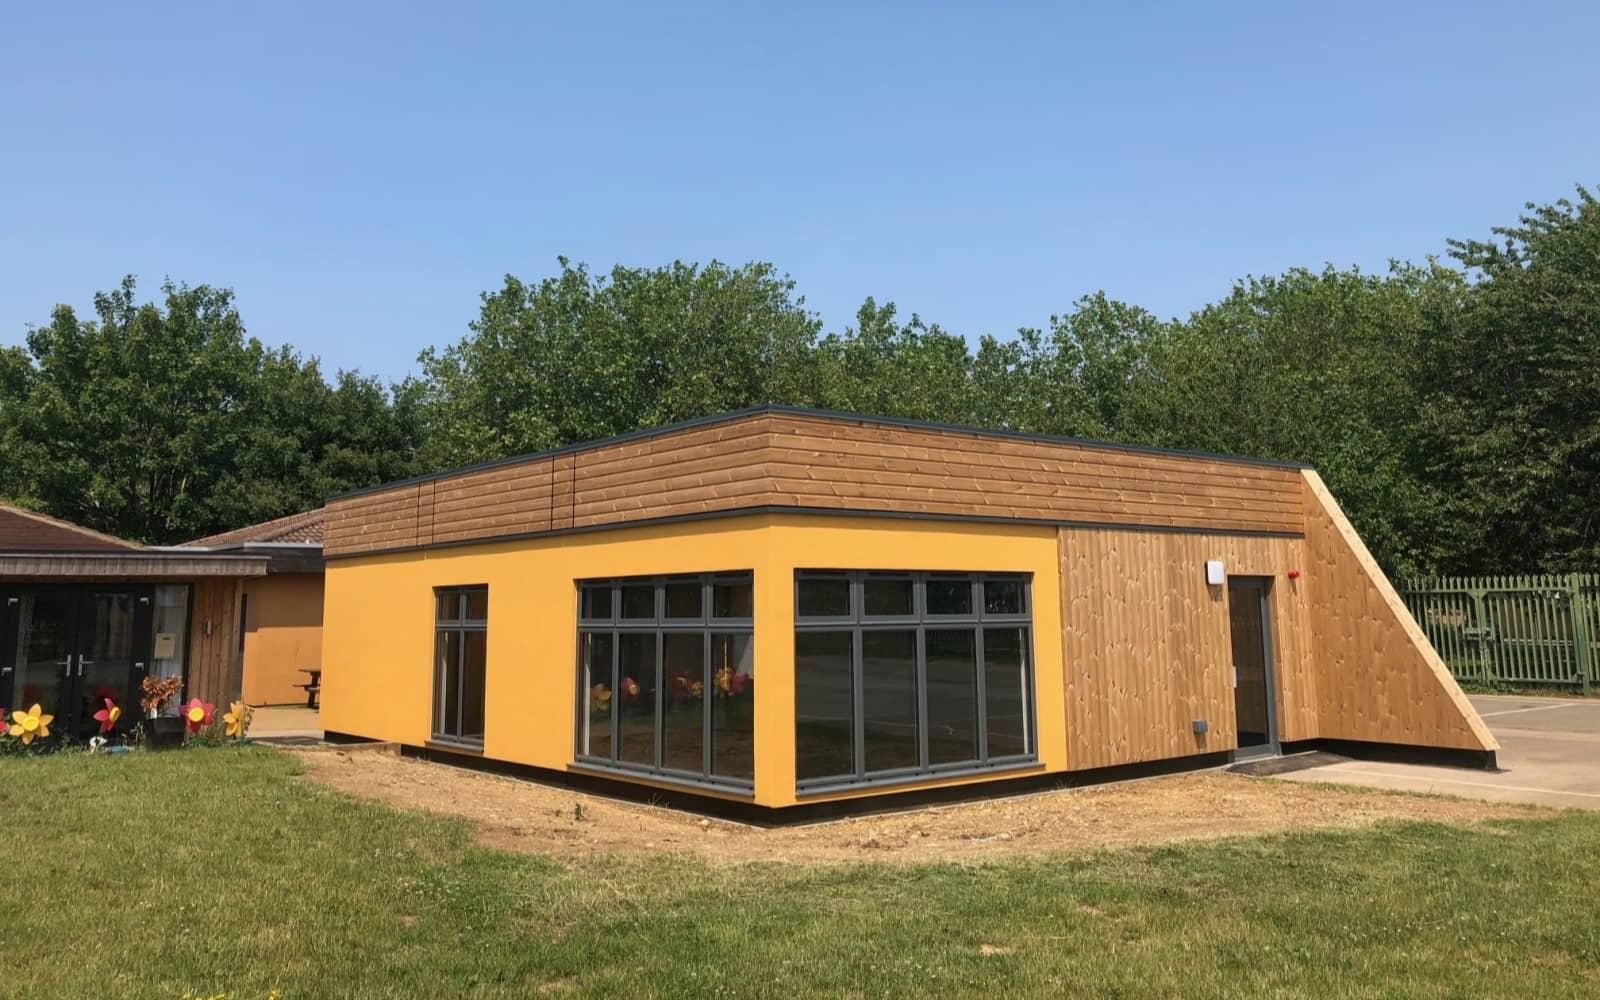 modular buildings by MPH Modular Building Company UK